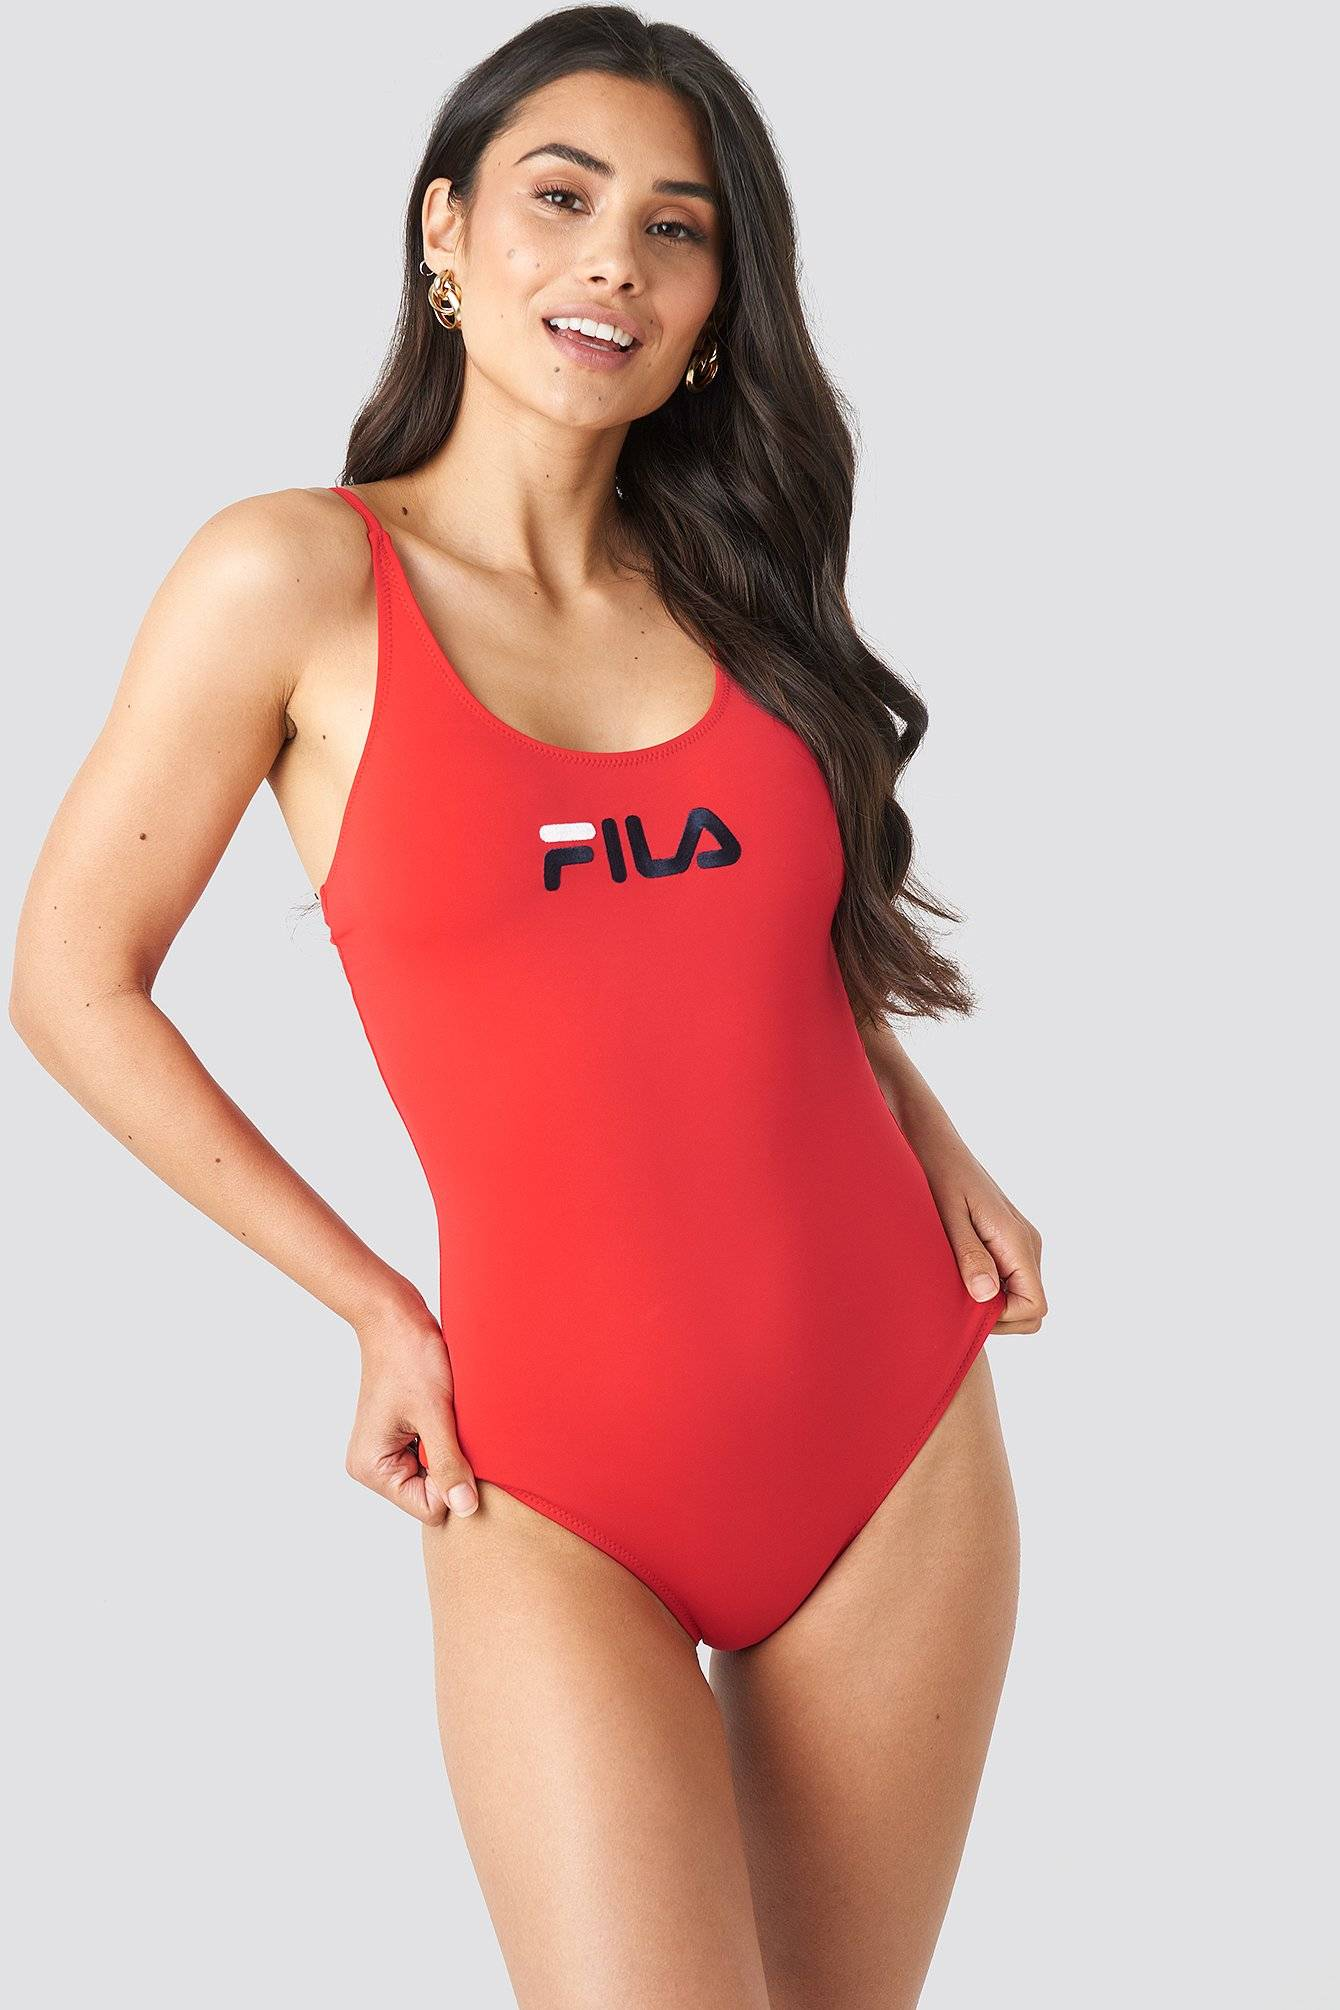 FILA Saidi Swimsuit x NA-KD - Red  - Size: Small